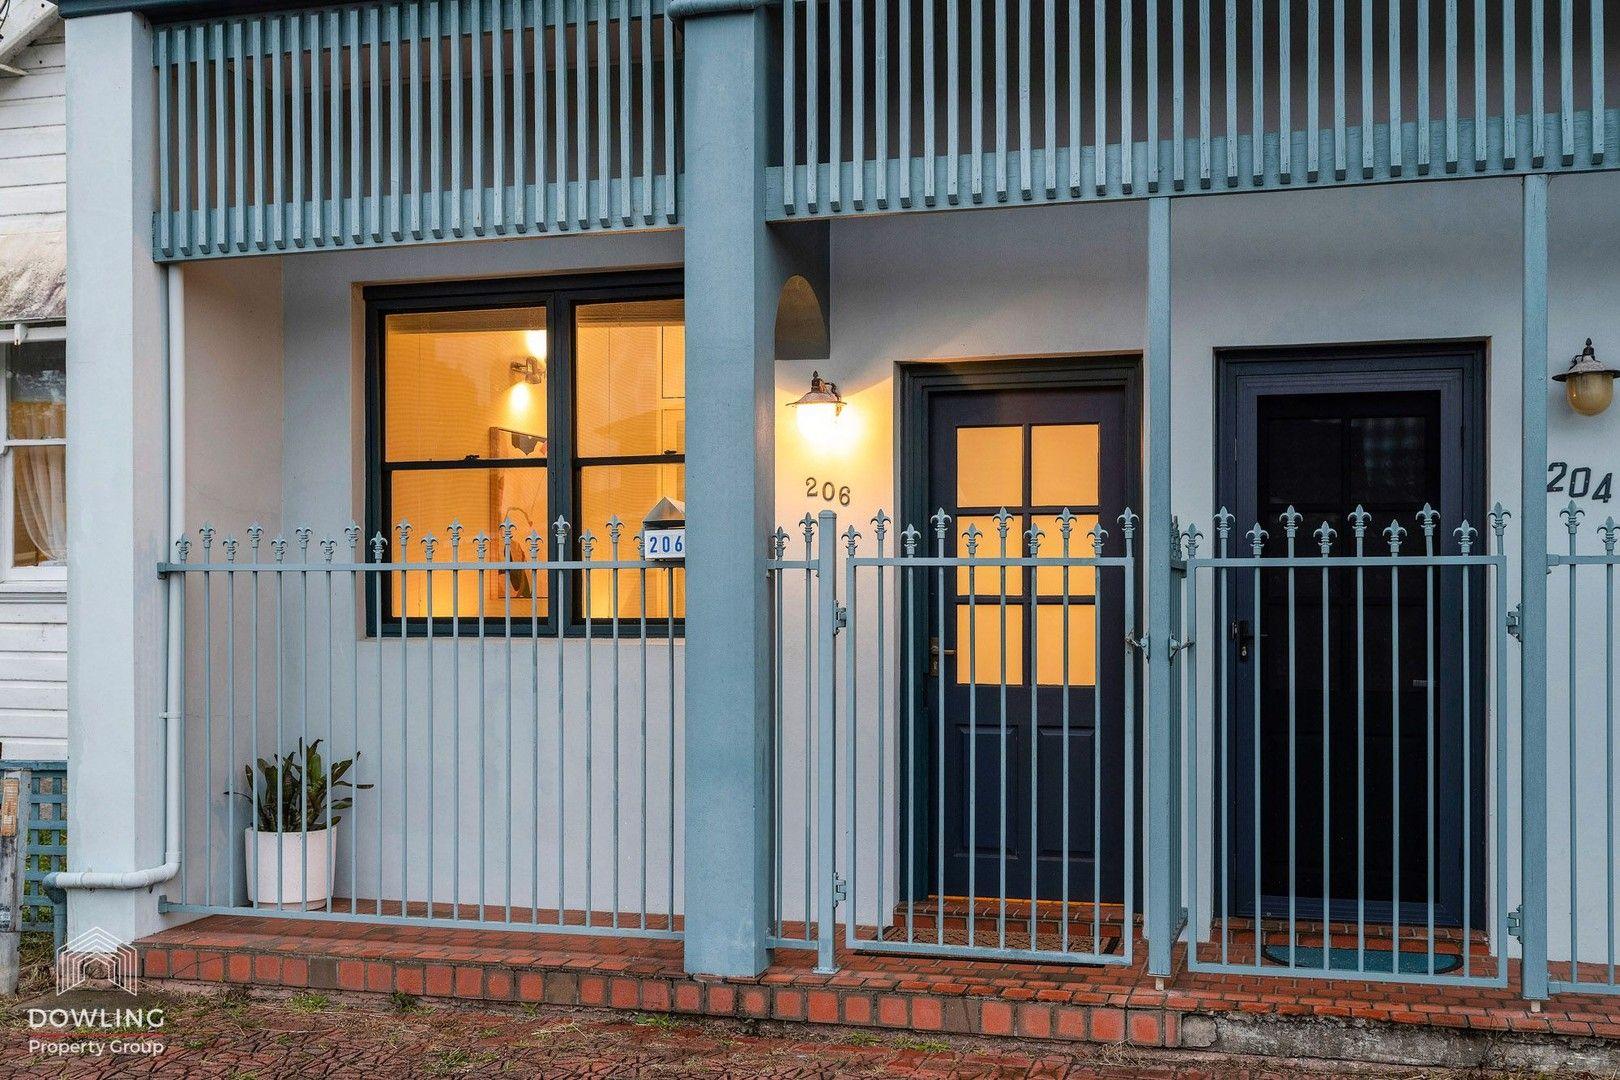 206 Lawson Street, Hamilton South NSW 2303, Image 0